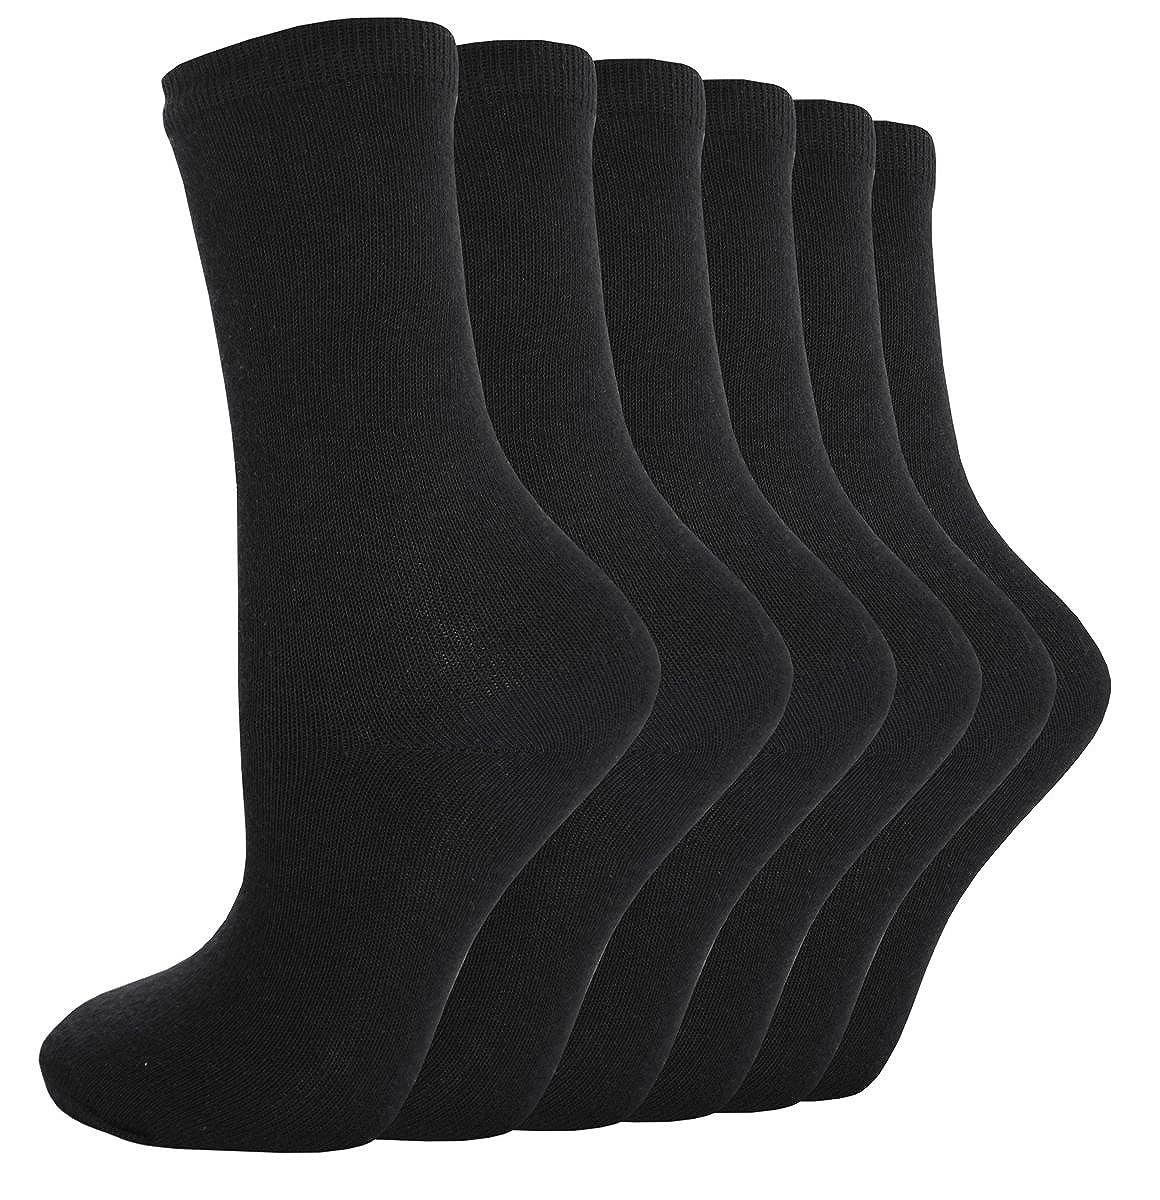 BAY6 Boys and Girls 6-12 Pairs Back To School Plain Uniform Socks